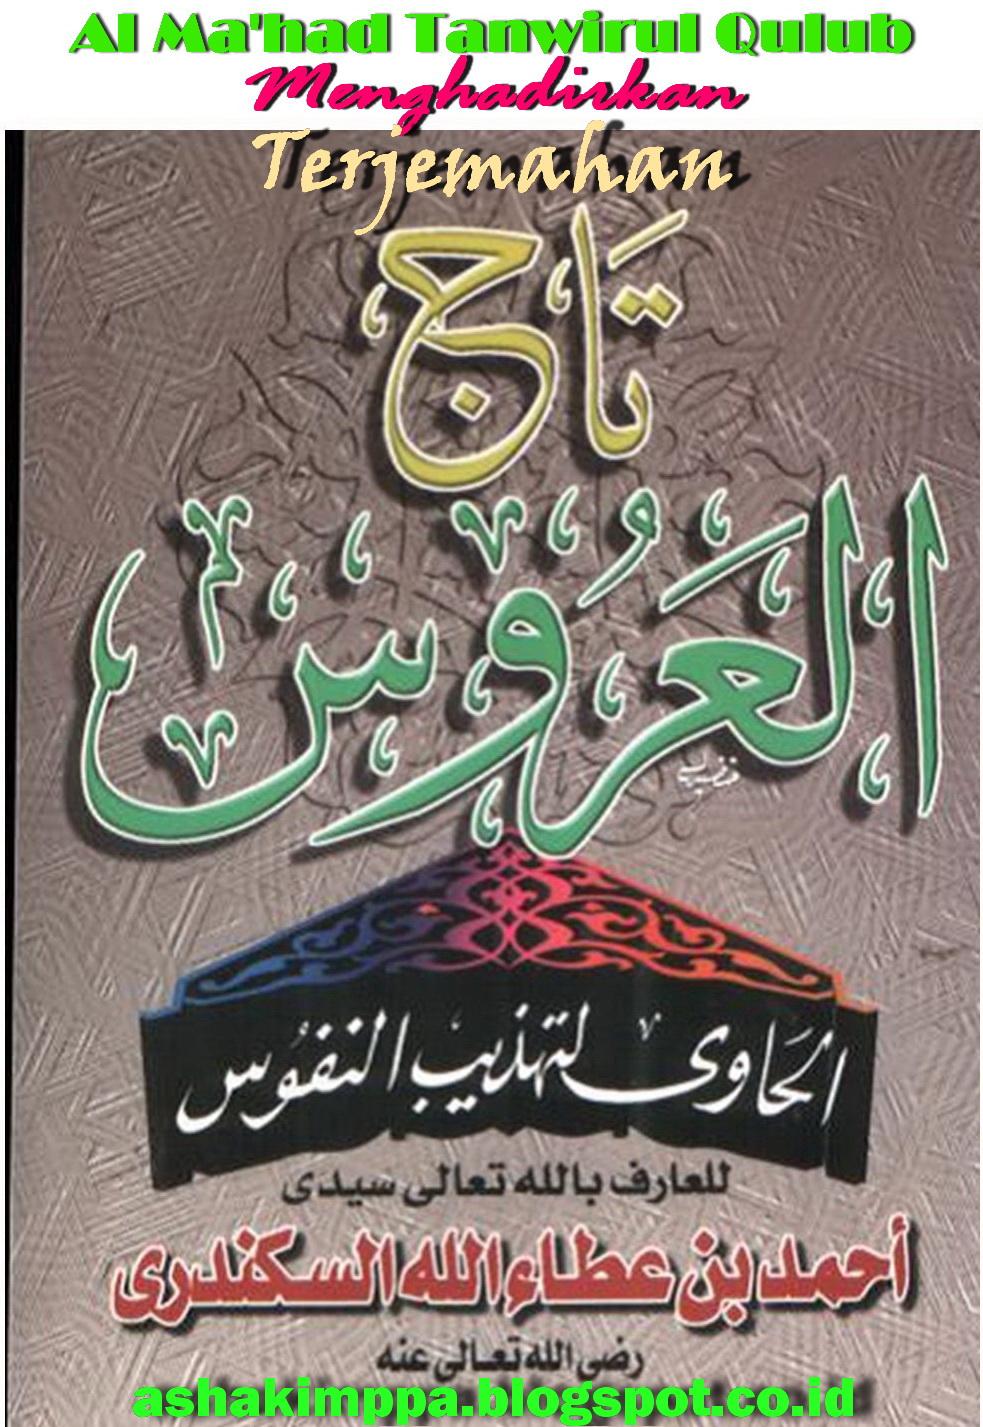 Kitab ihya ulumuddin terjemahan ebook